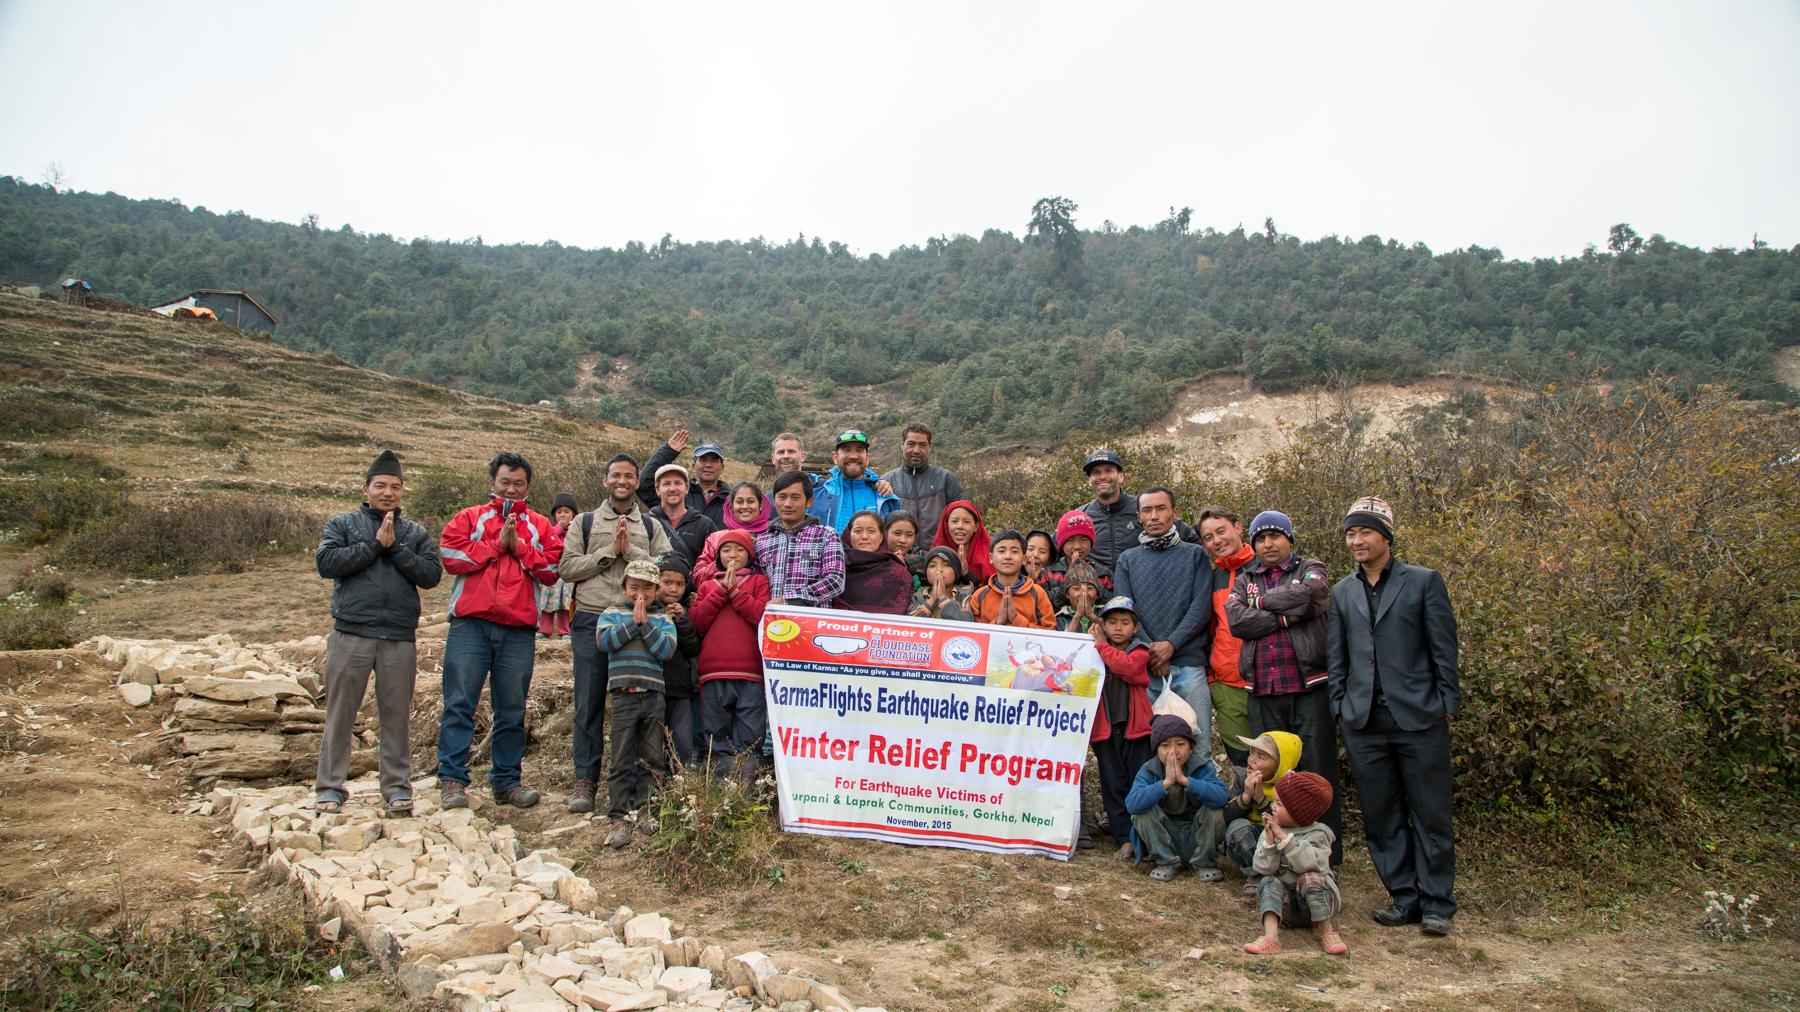 2015_11_28_Nepal_Day 11_A7R_Stills_0344.jpg